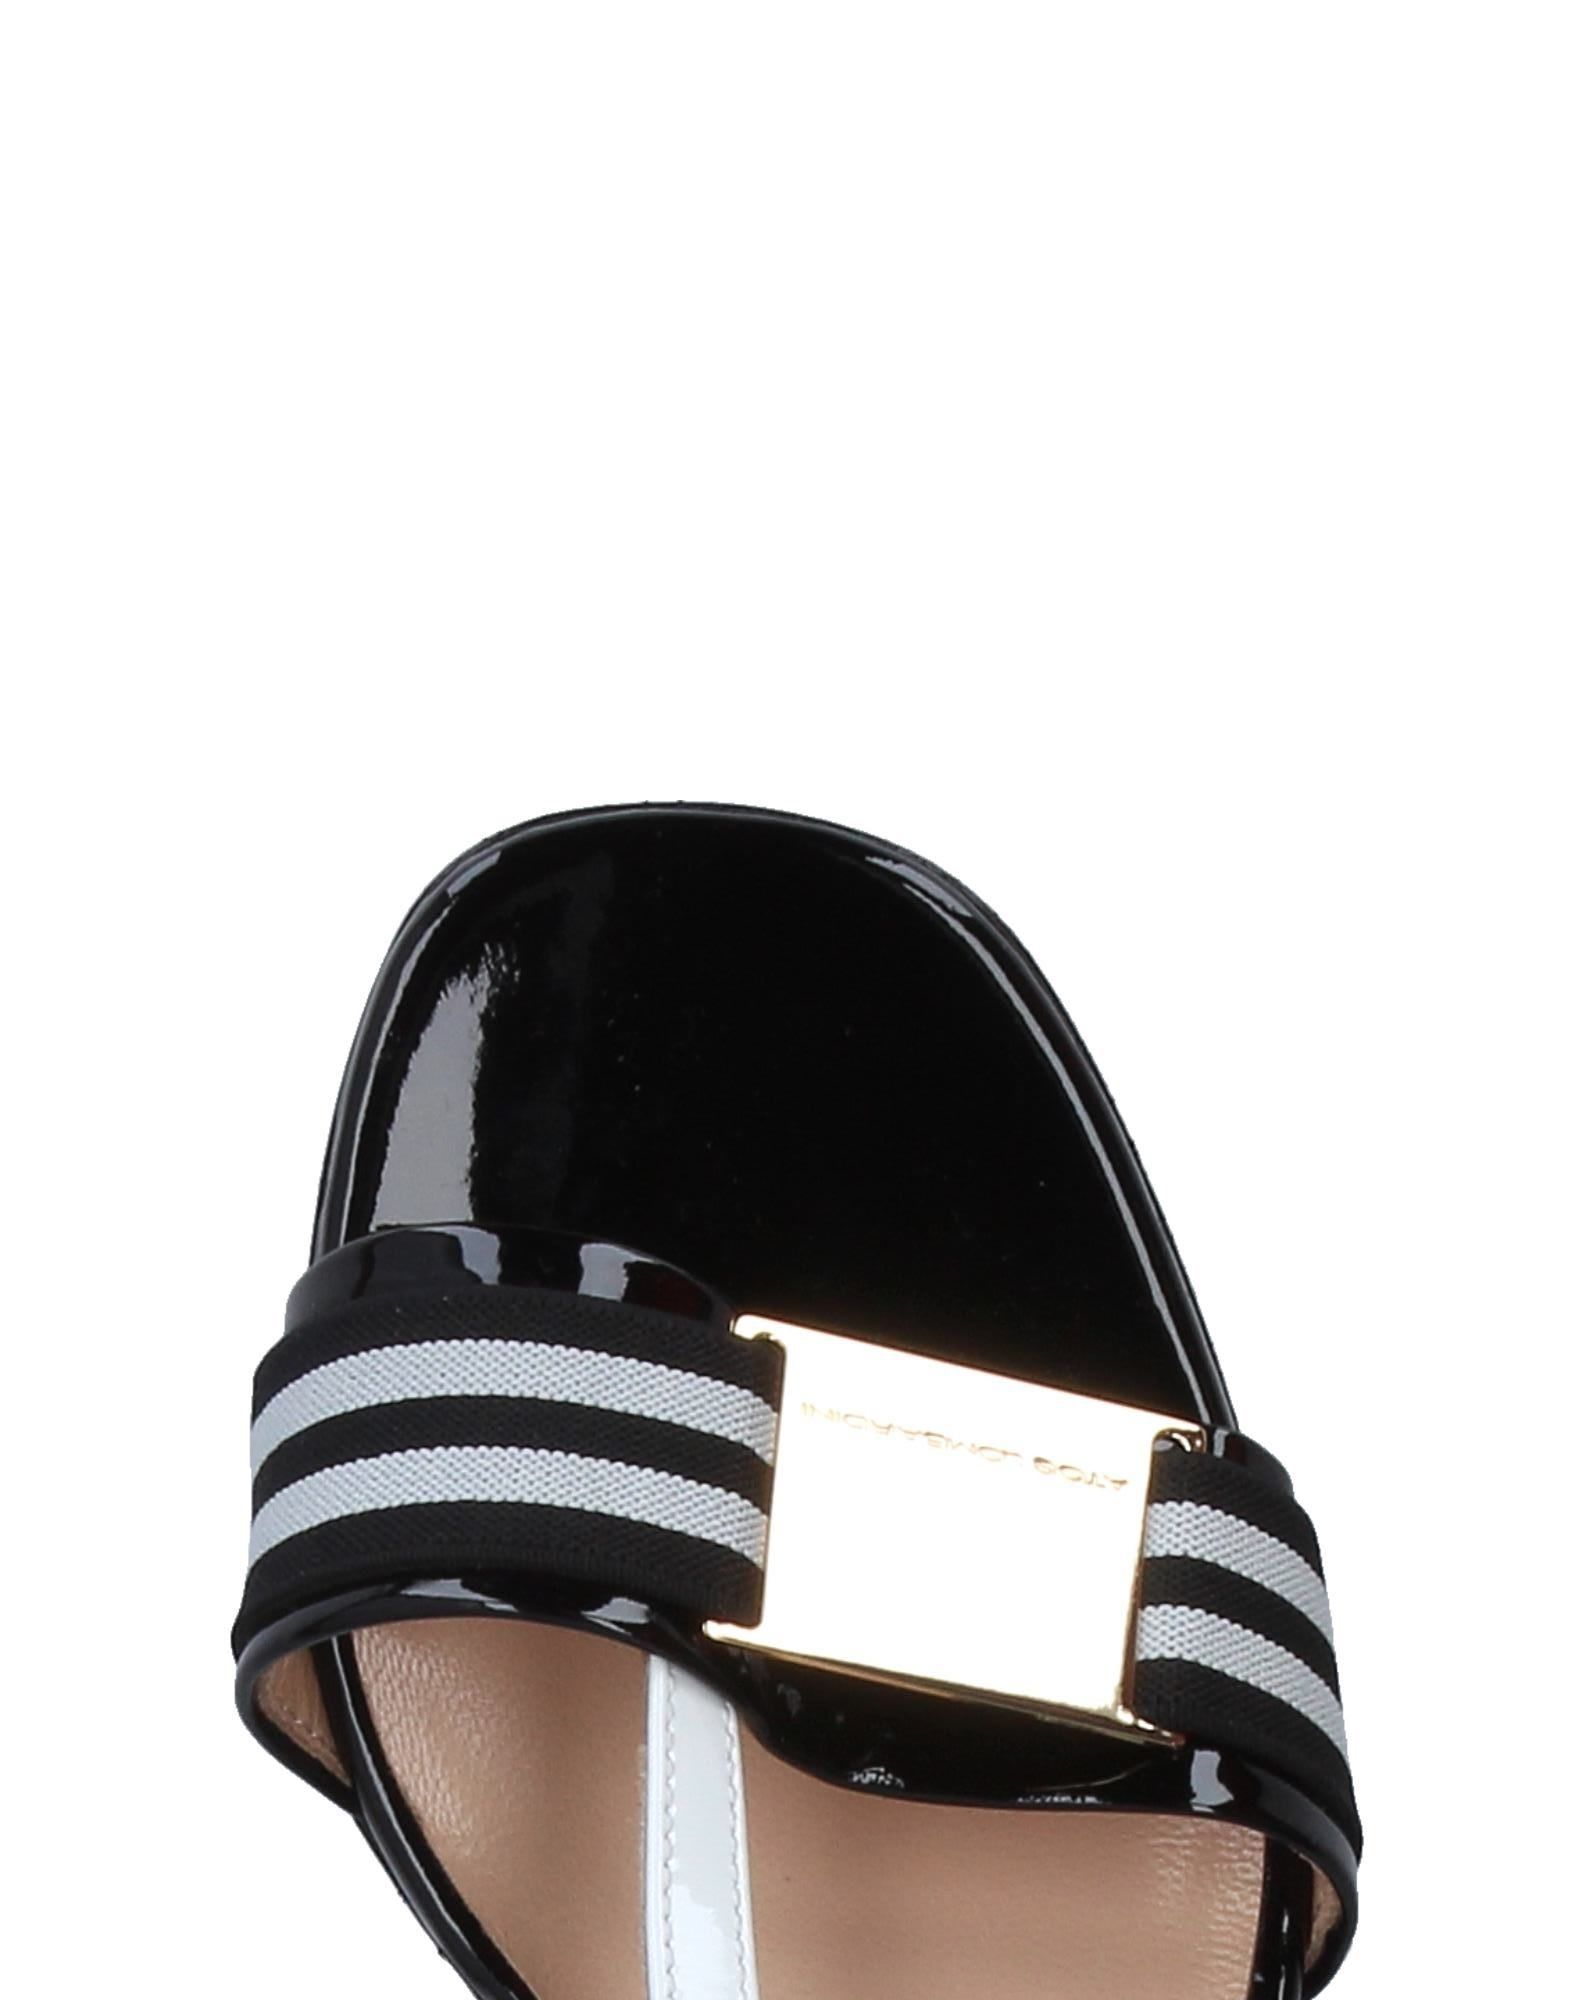 Atos Lombardini Sandalen Damen  11326017IB Gute Qualität beliebte Schuhe